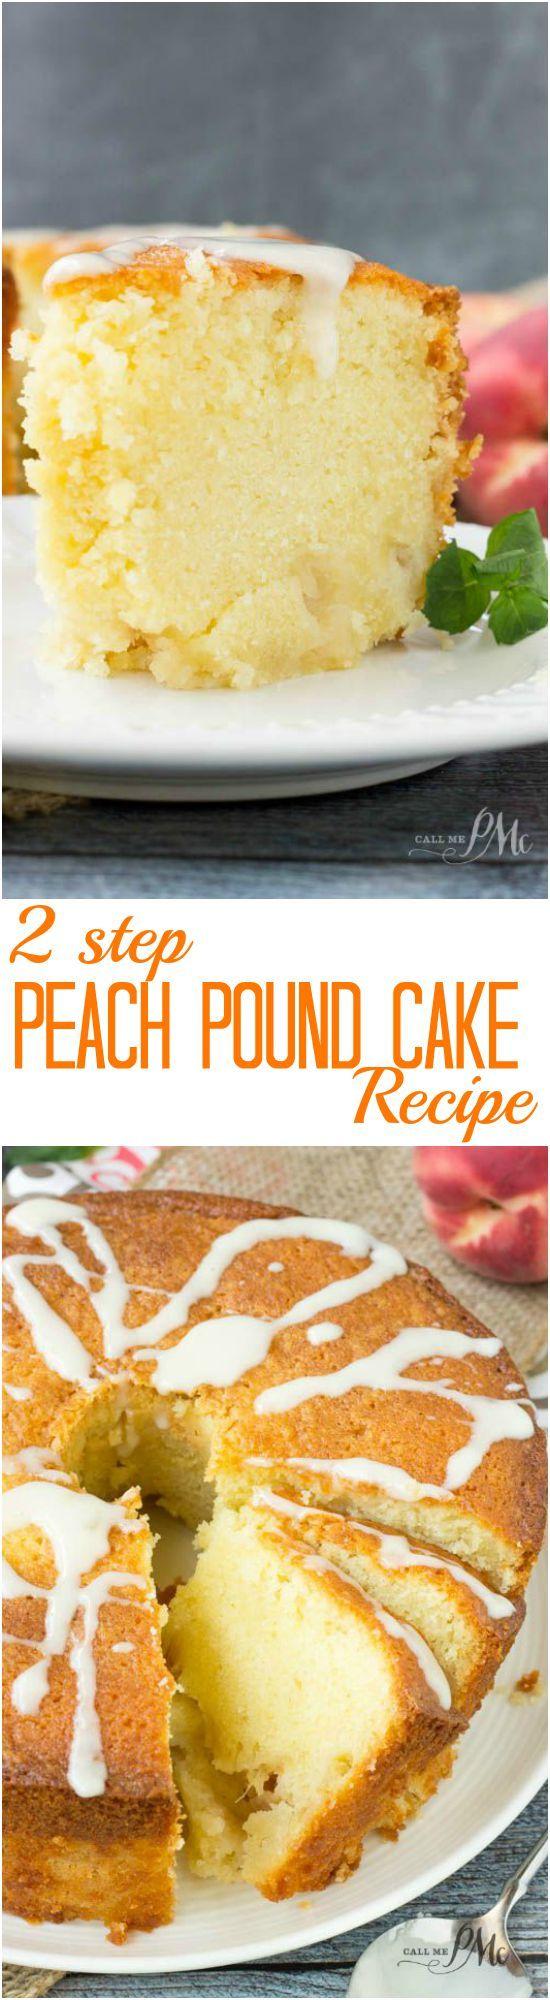 Two Step Fresh Peach Pound Cake Recipe Call Me Pmc Peach Pound Cakes Desserts Pound Cake Recipes